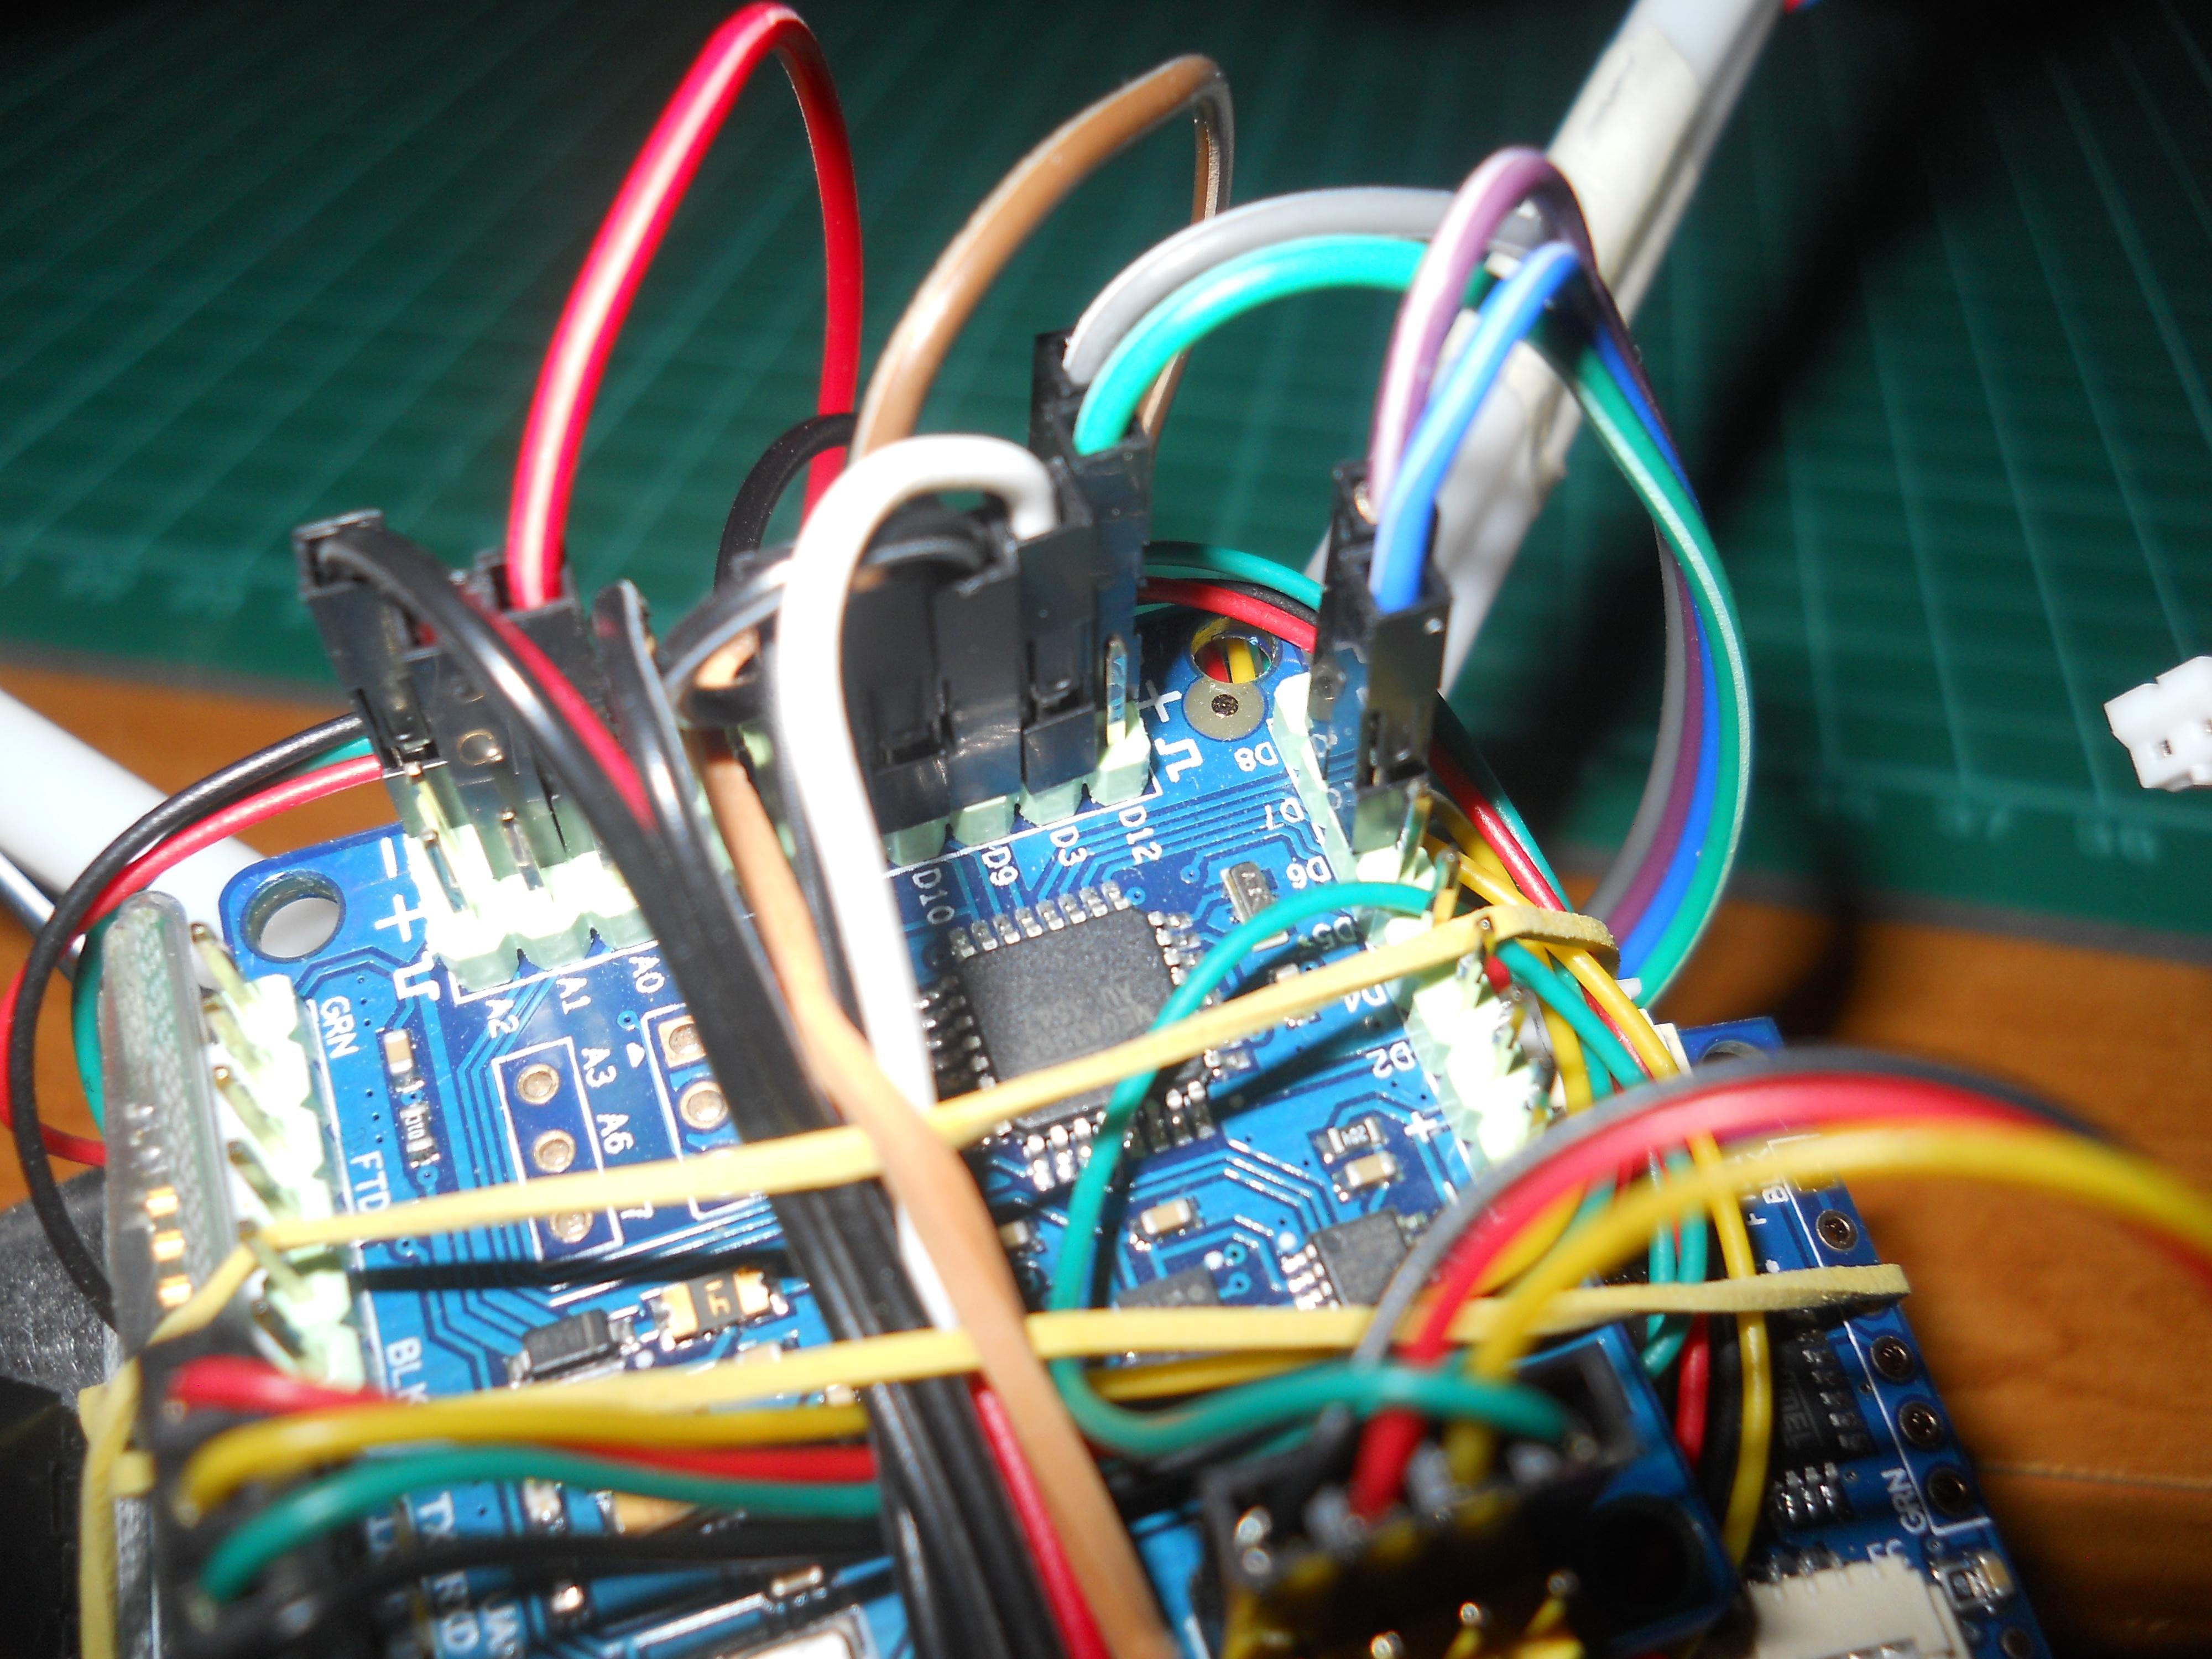 Picture of The Ultrasonic Sensor